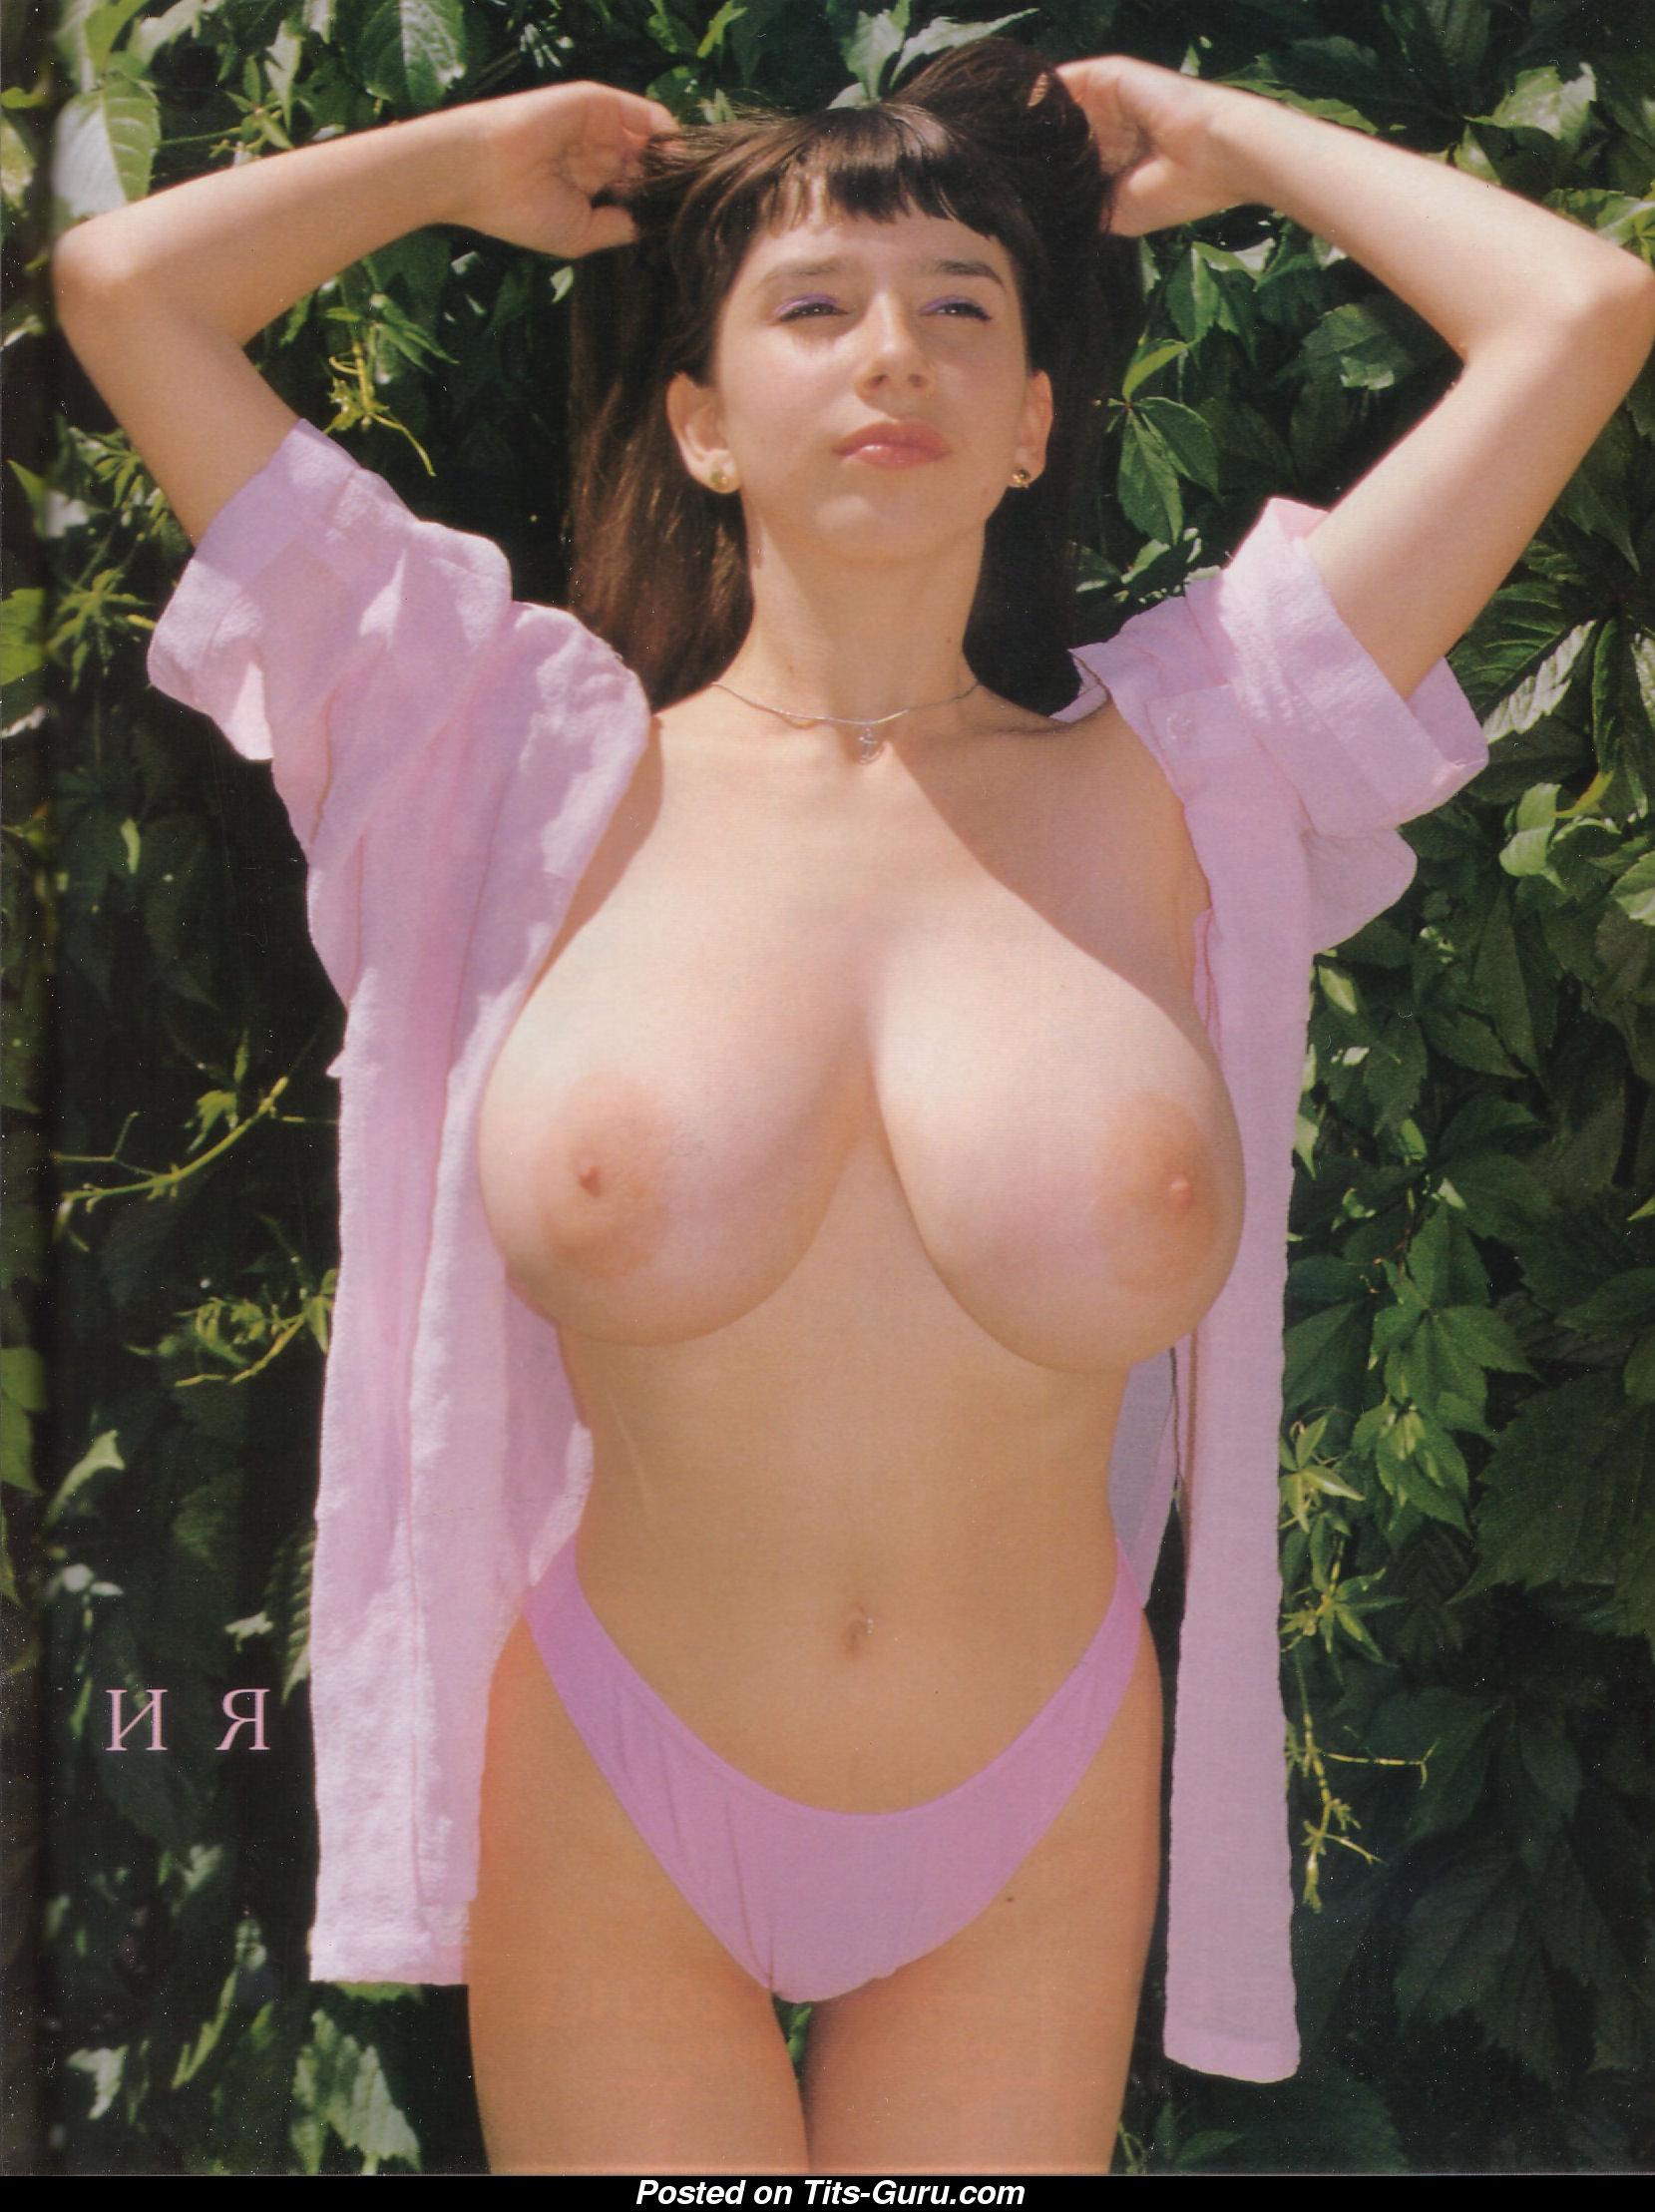 Yulia nova tits